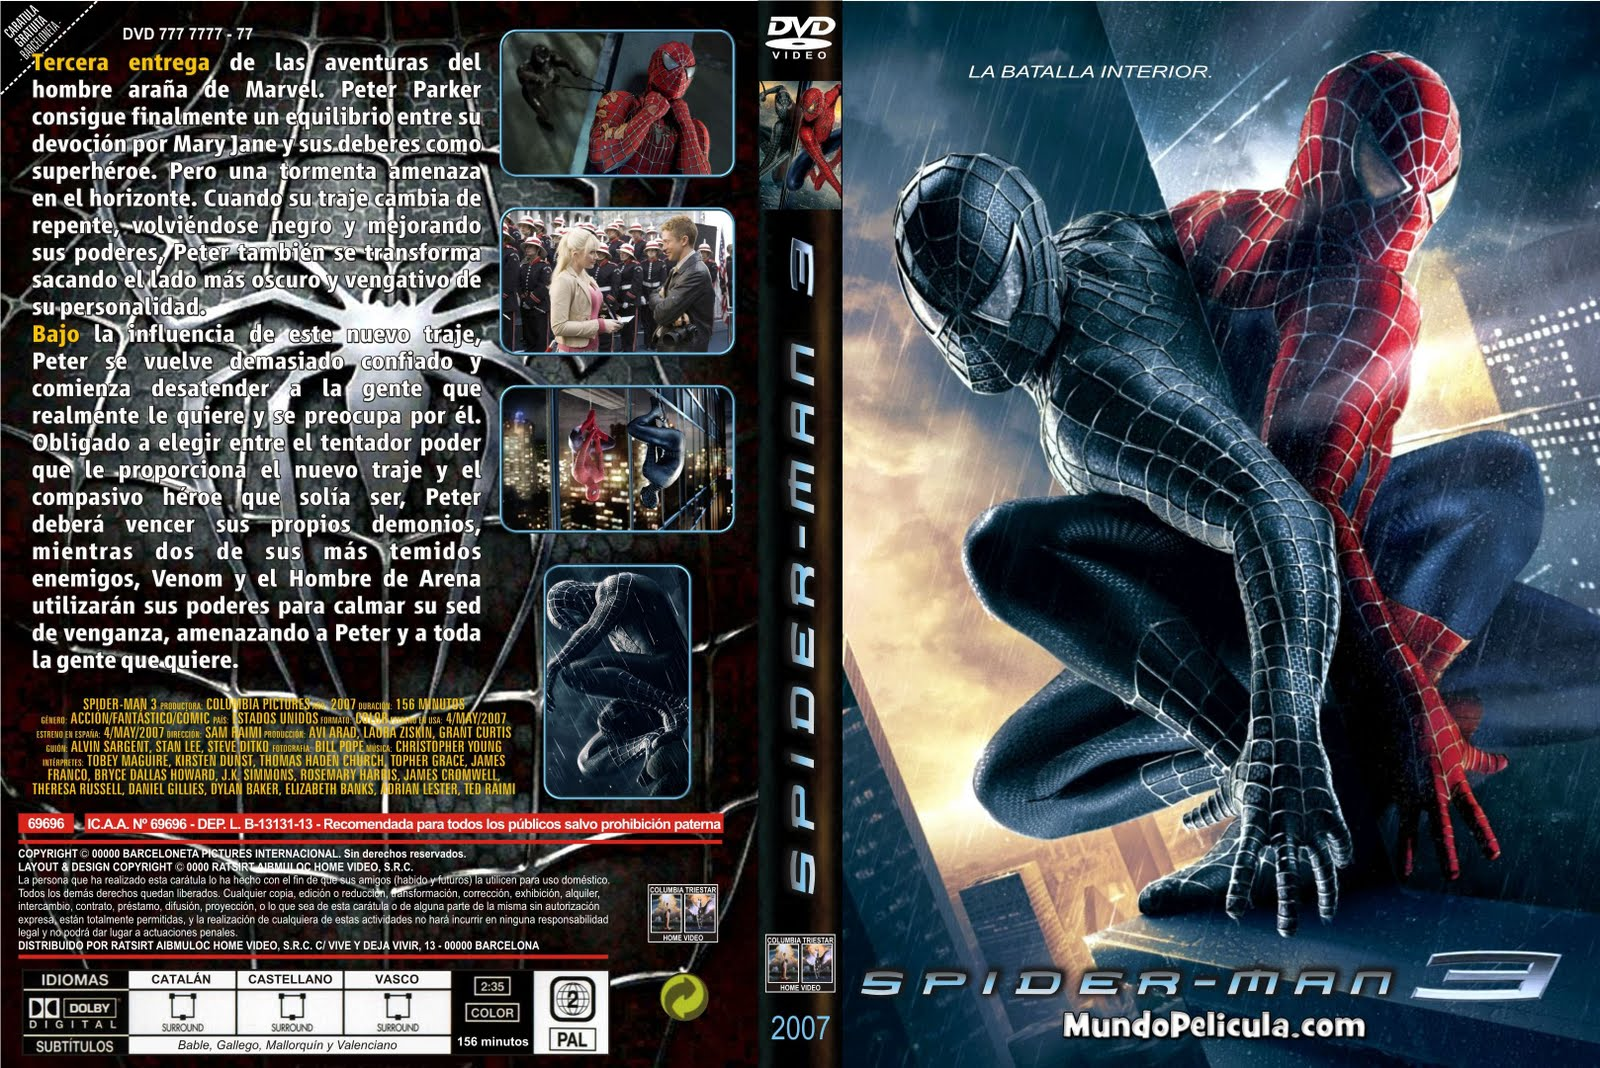 http://3.bp.blogspot.com/_oX5-W-SruQM/SzI1BBaO-II/AAAAAAAABPs/N4XInu8276g/S1600-R/Spider-man_3_-(MundoPelicula.com).jpg